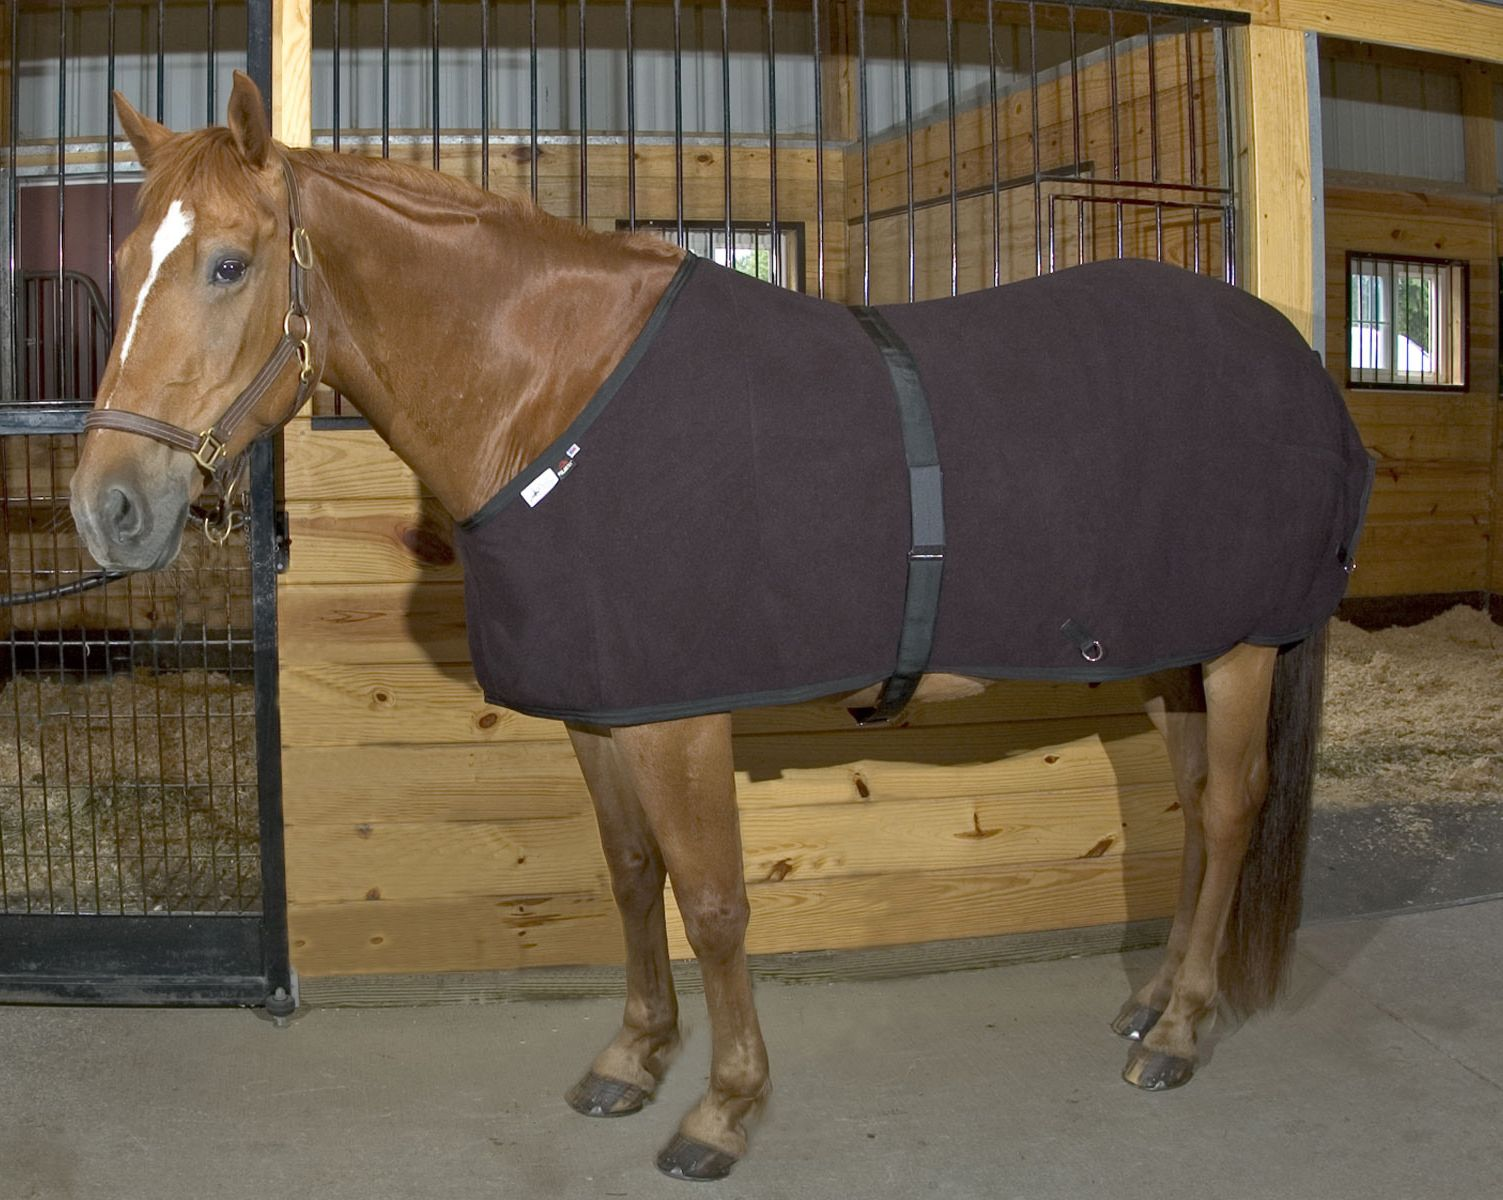 Saratoga Horseworks Deluxe PolarTec Horse Blanket Liner